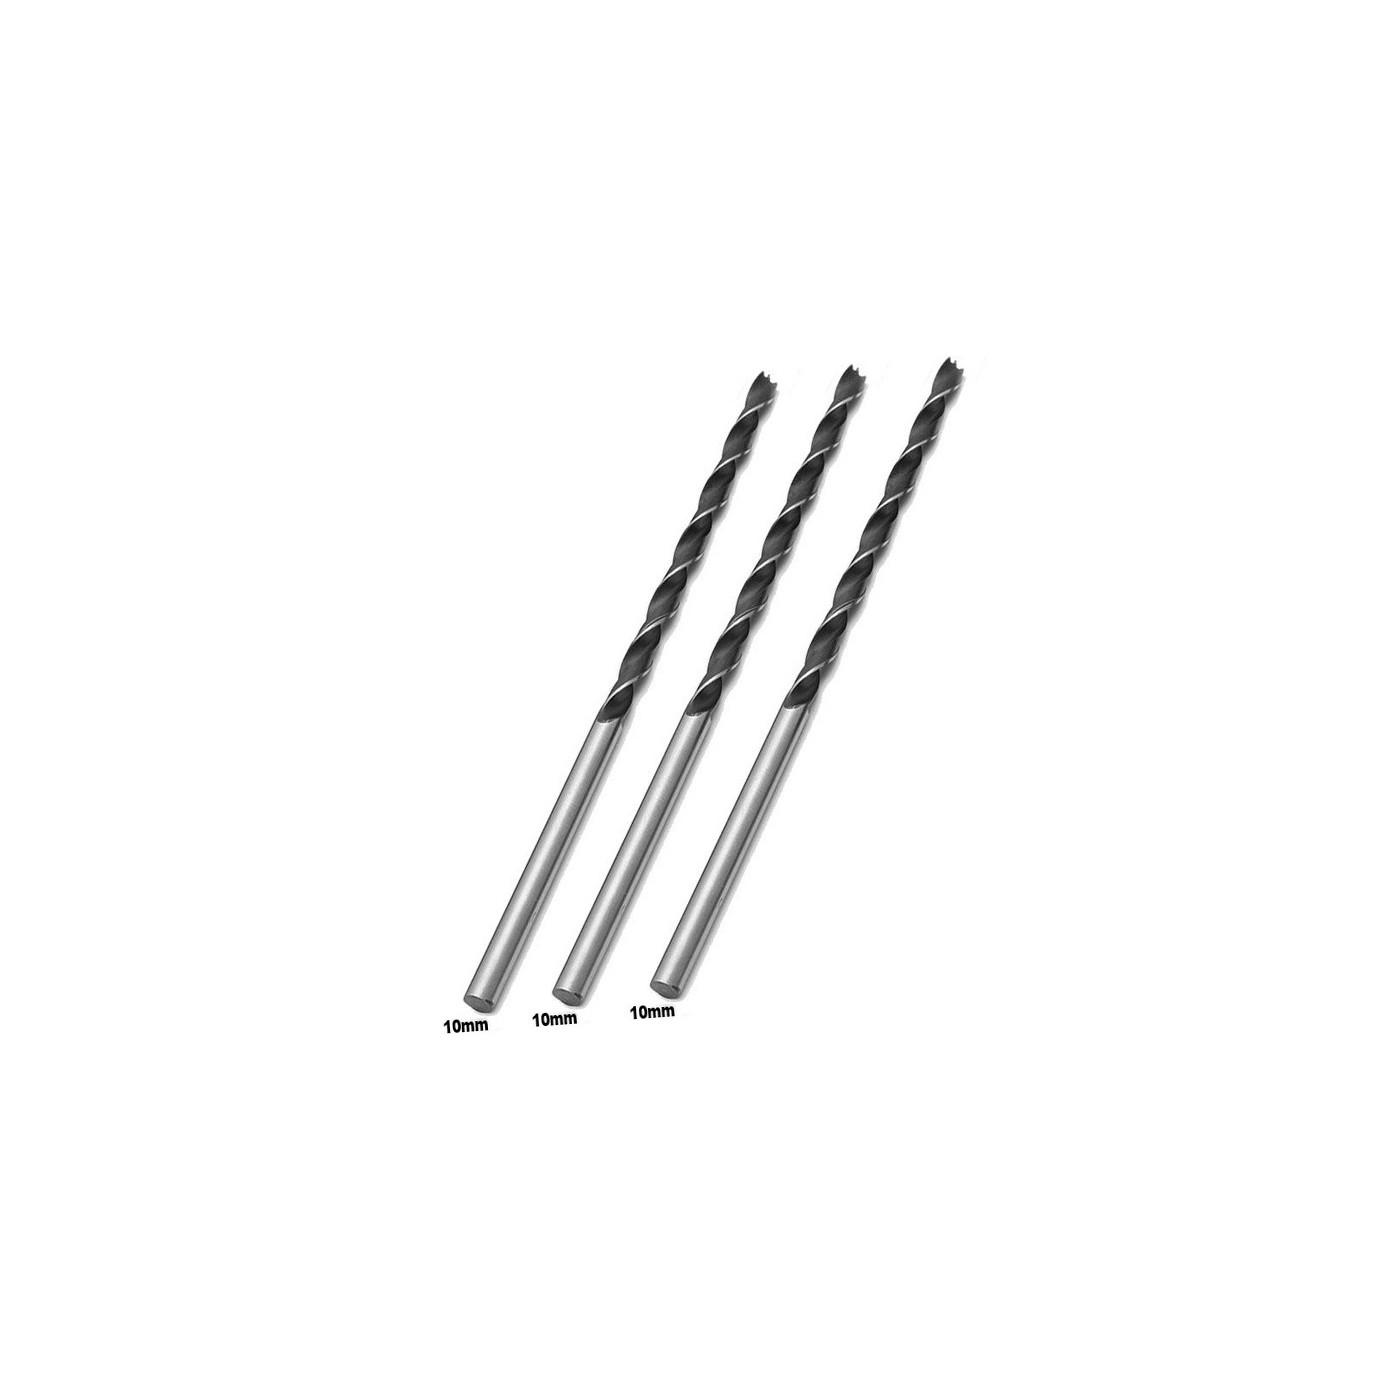 Juego de 3 brocas de madera extra largas (10x300 mm)  - 1